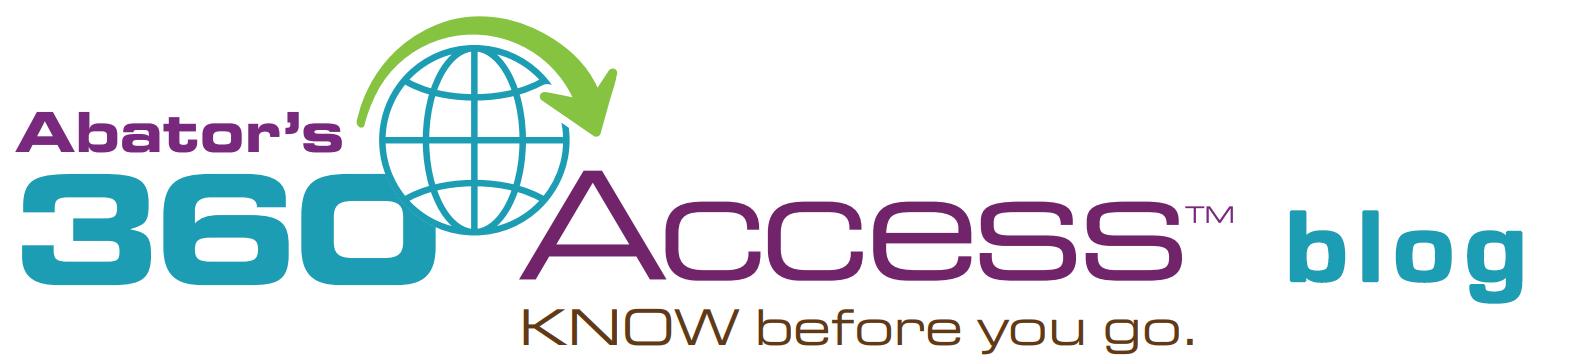 Abator's 360-Access Logo